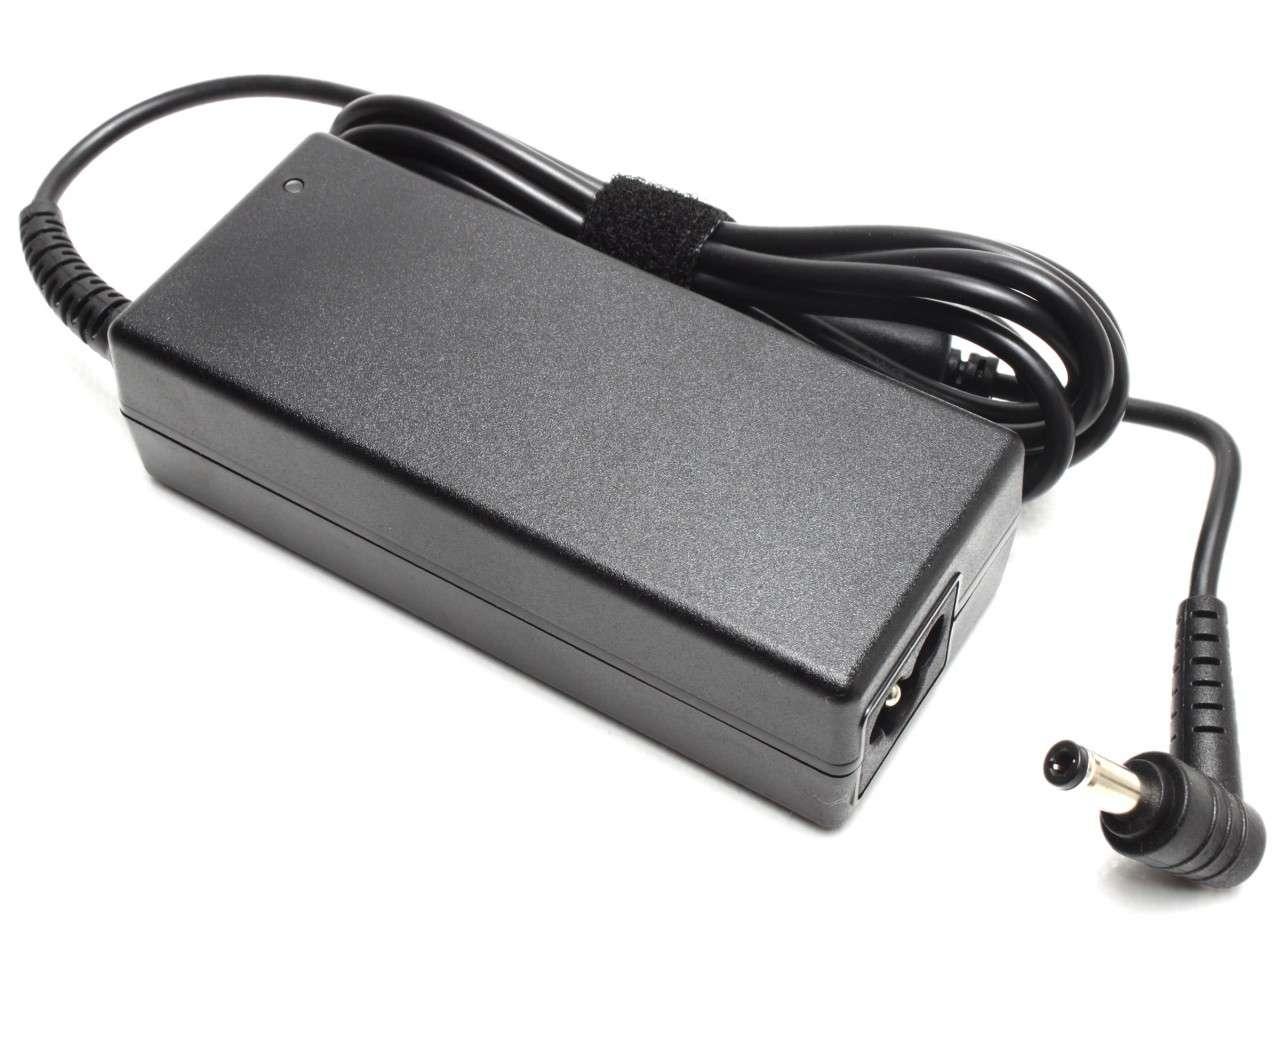 Incarcator Advent 9115 imagine powerlaptop.ro 2021